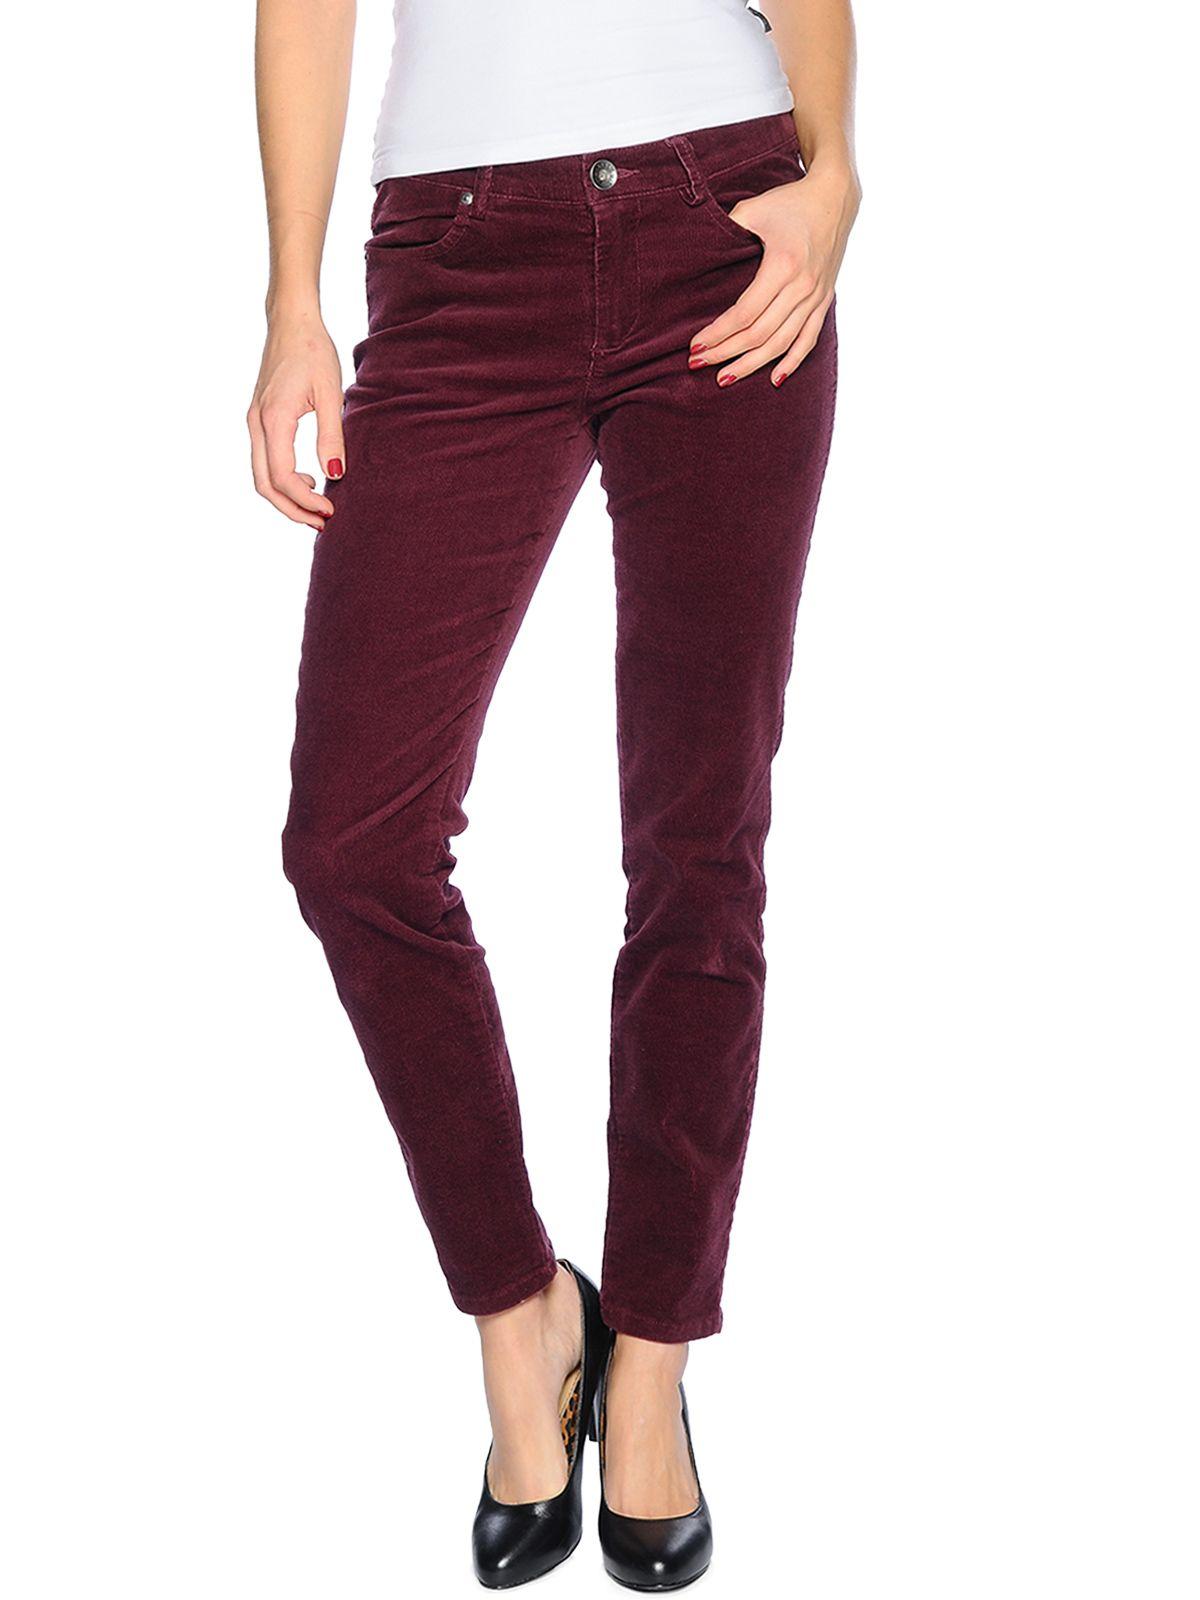 Sisley Pantalon De Pana Forma Normal 23 99 Pantalones De Pana Ropa Pantalones Vino